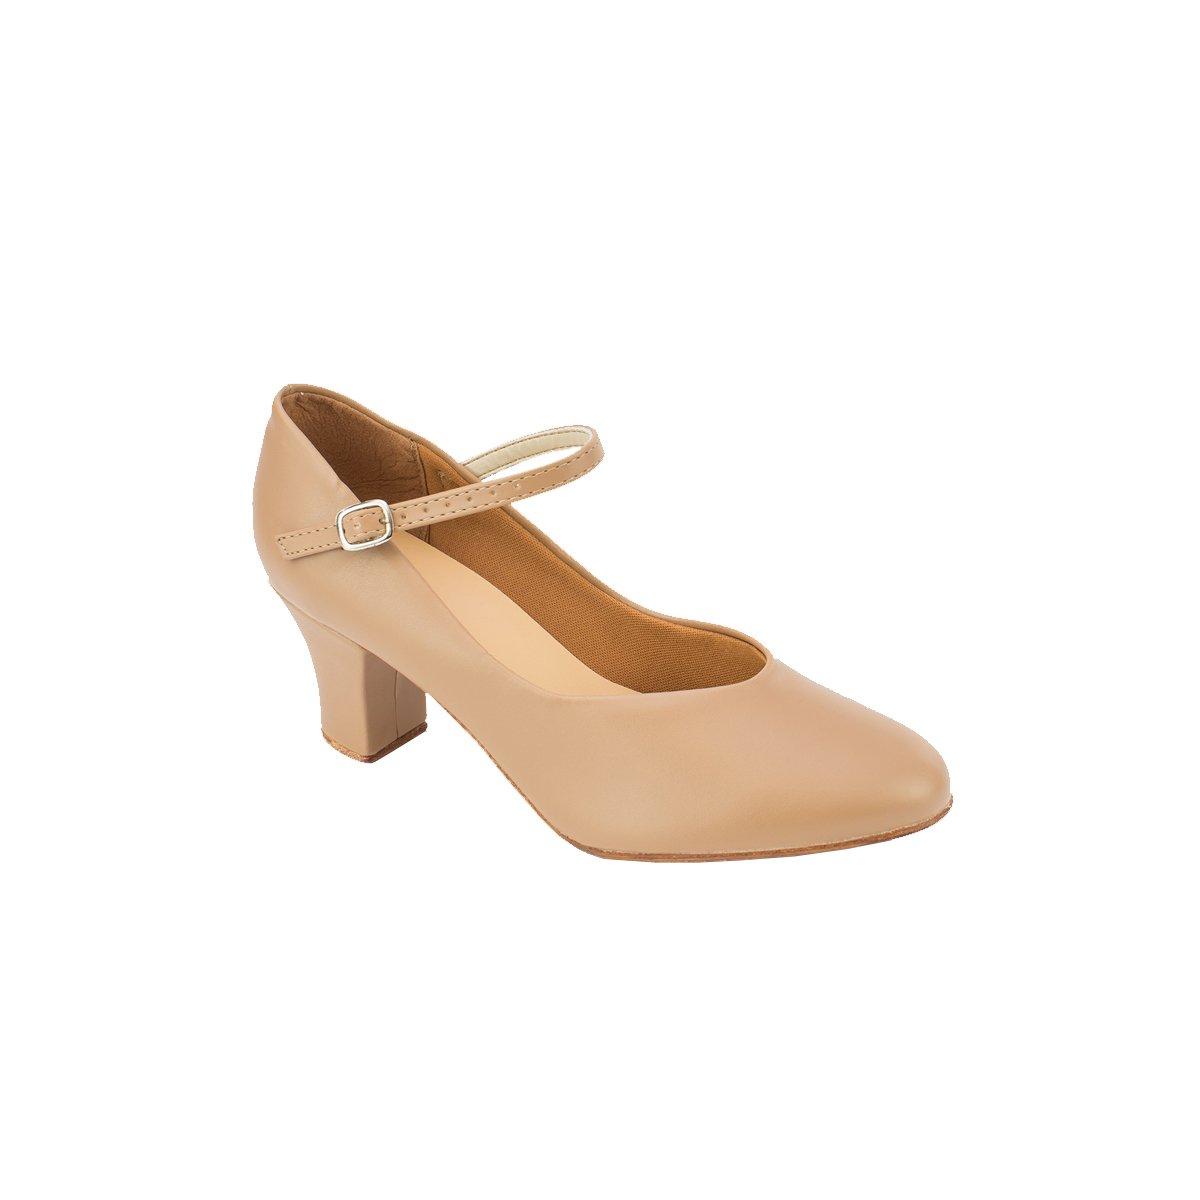 Sodanca Ch-52 Adult Charlene 2 Heel Character Shoe